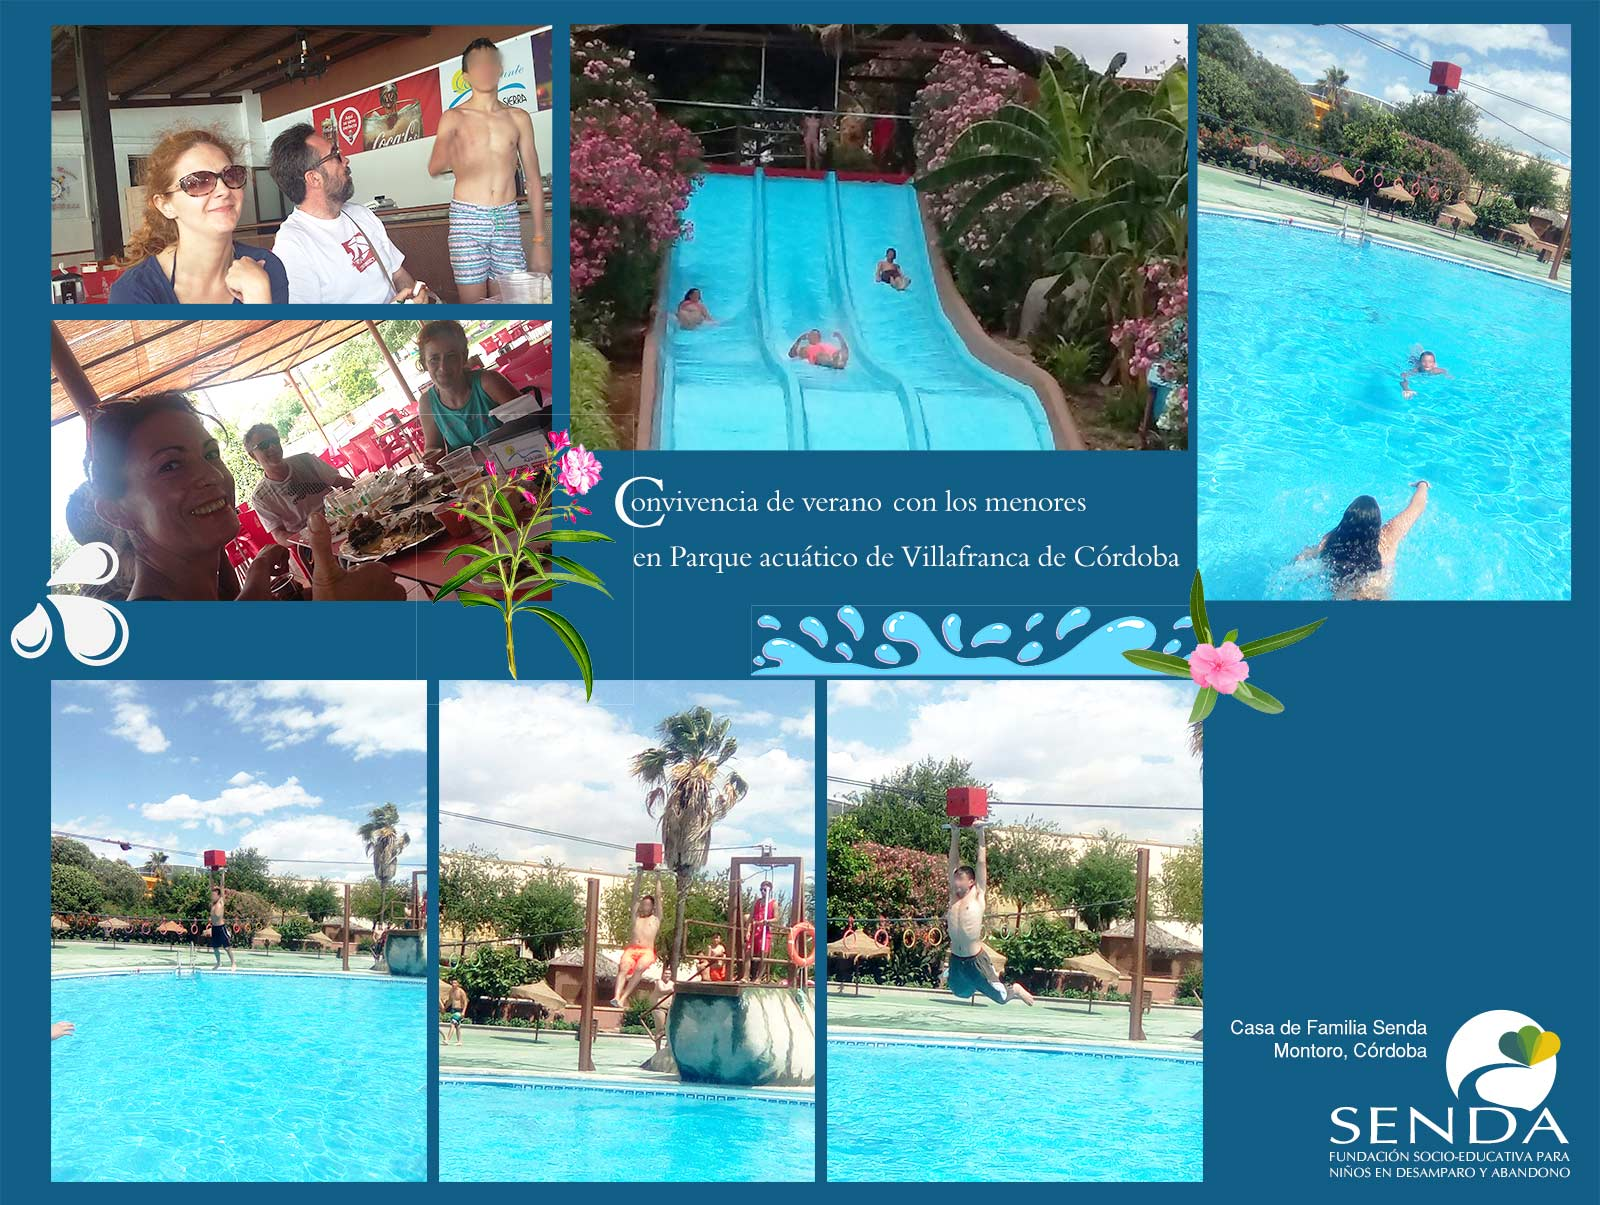 Convivencia verano 2016 Casa de Familia Senda Parque acuatico Villafranca Córdoba